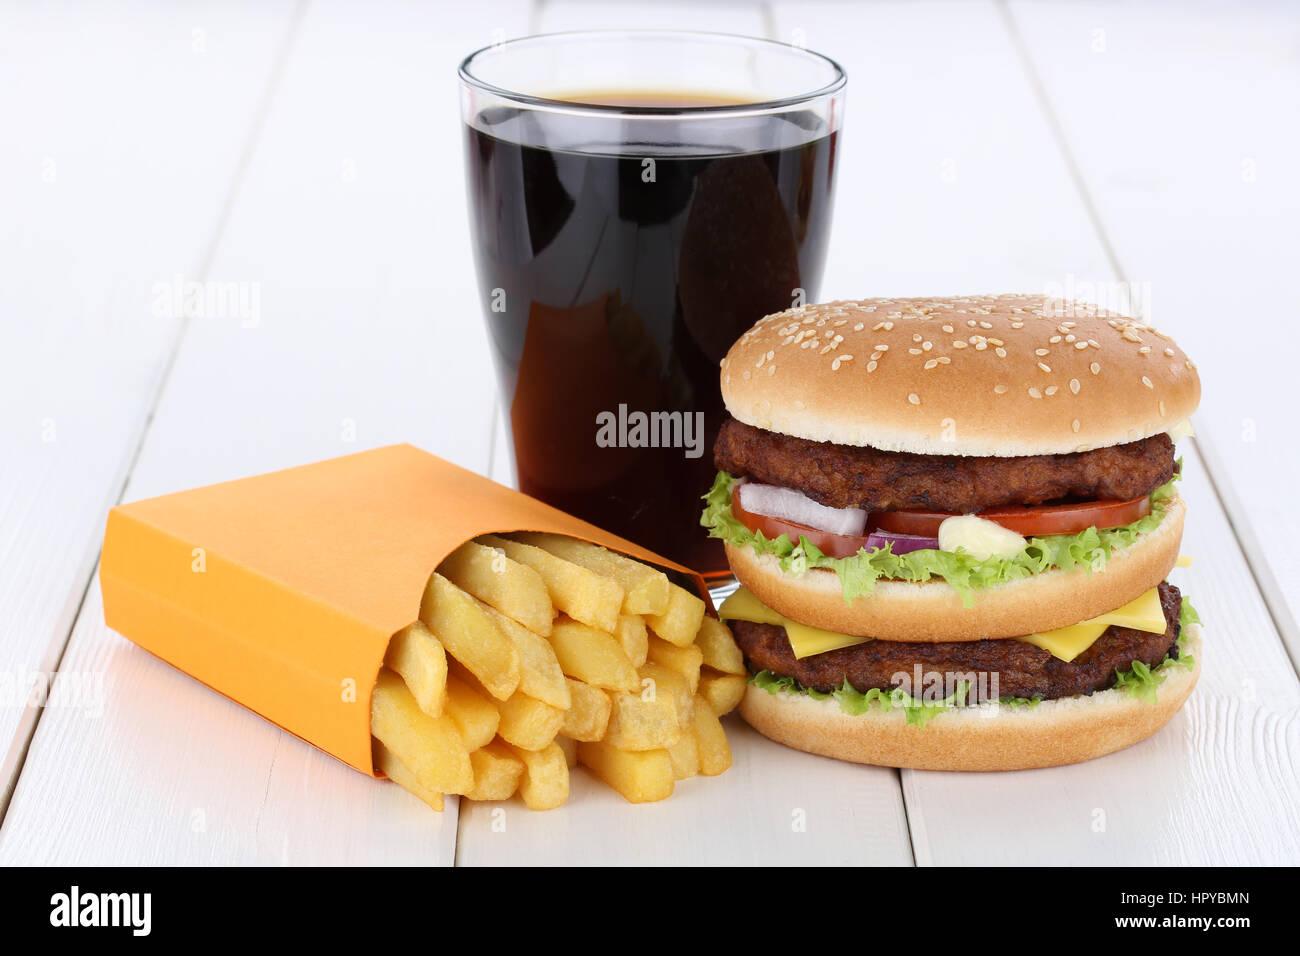 Double burger hamburger and fries menu meal combo cola drink - Stock Image